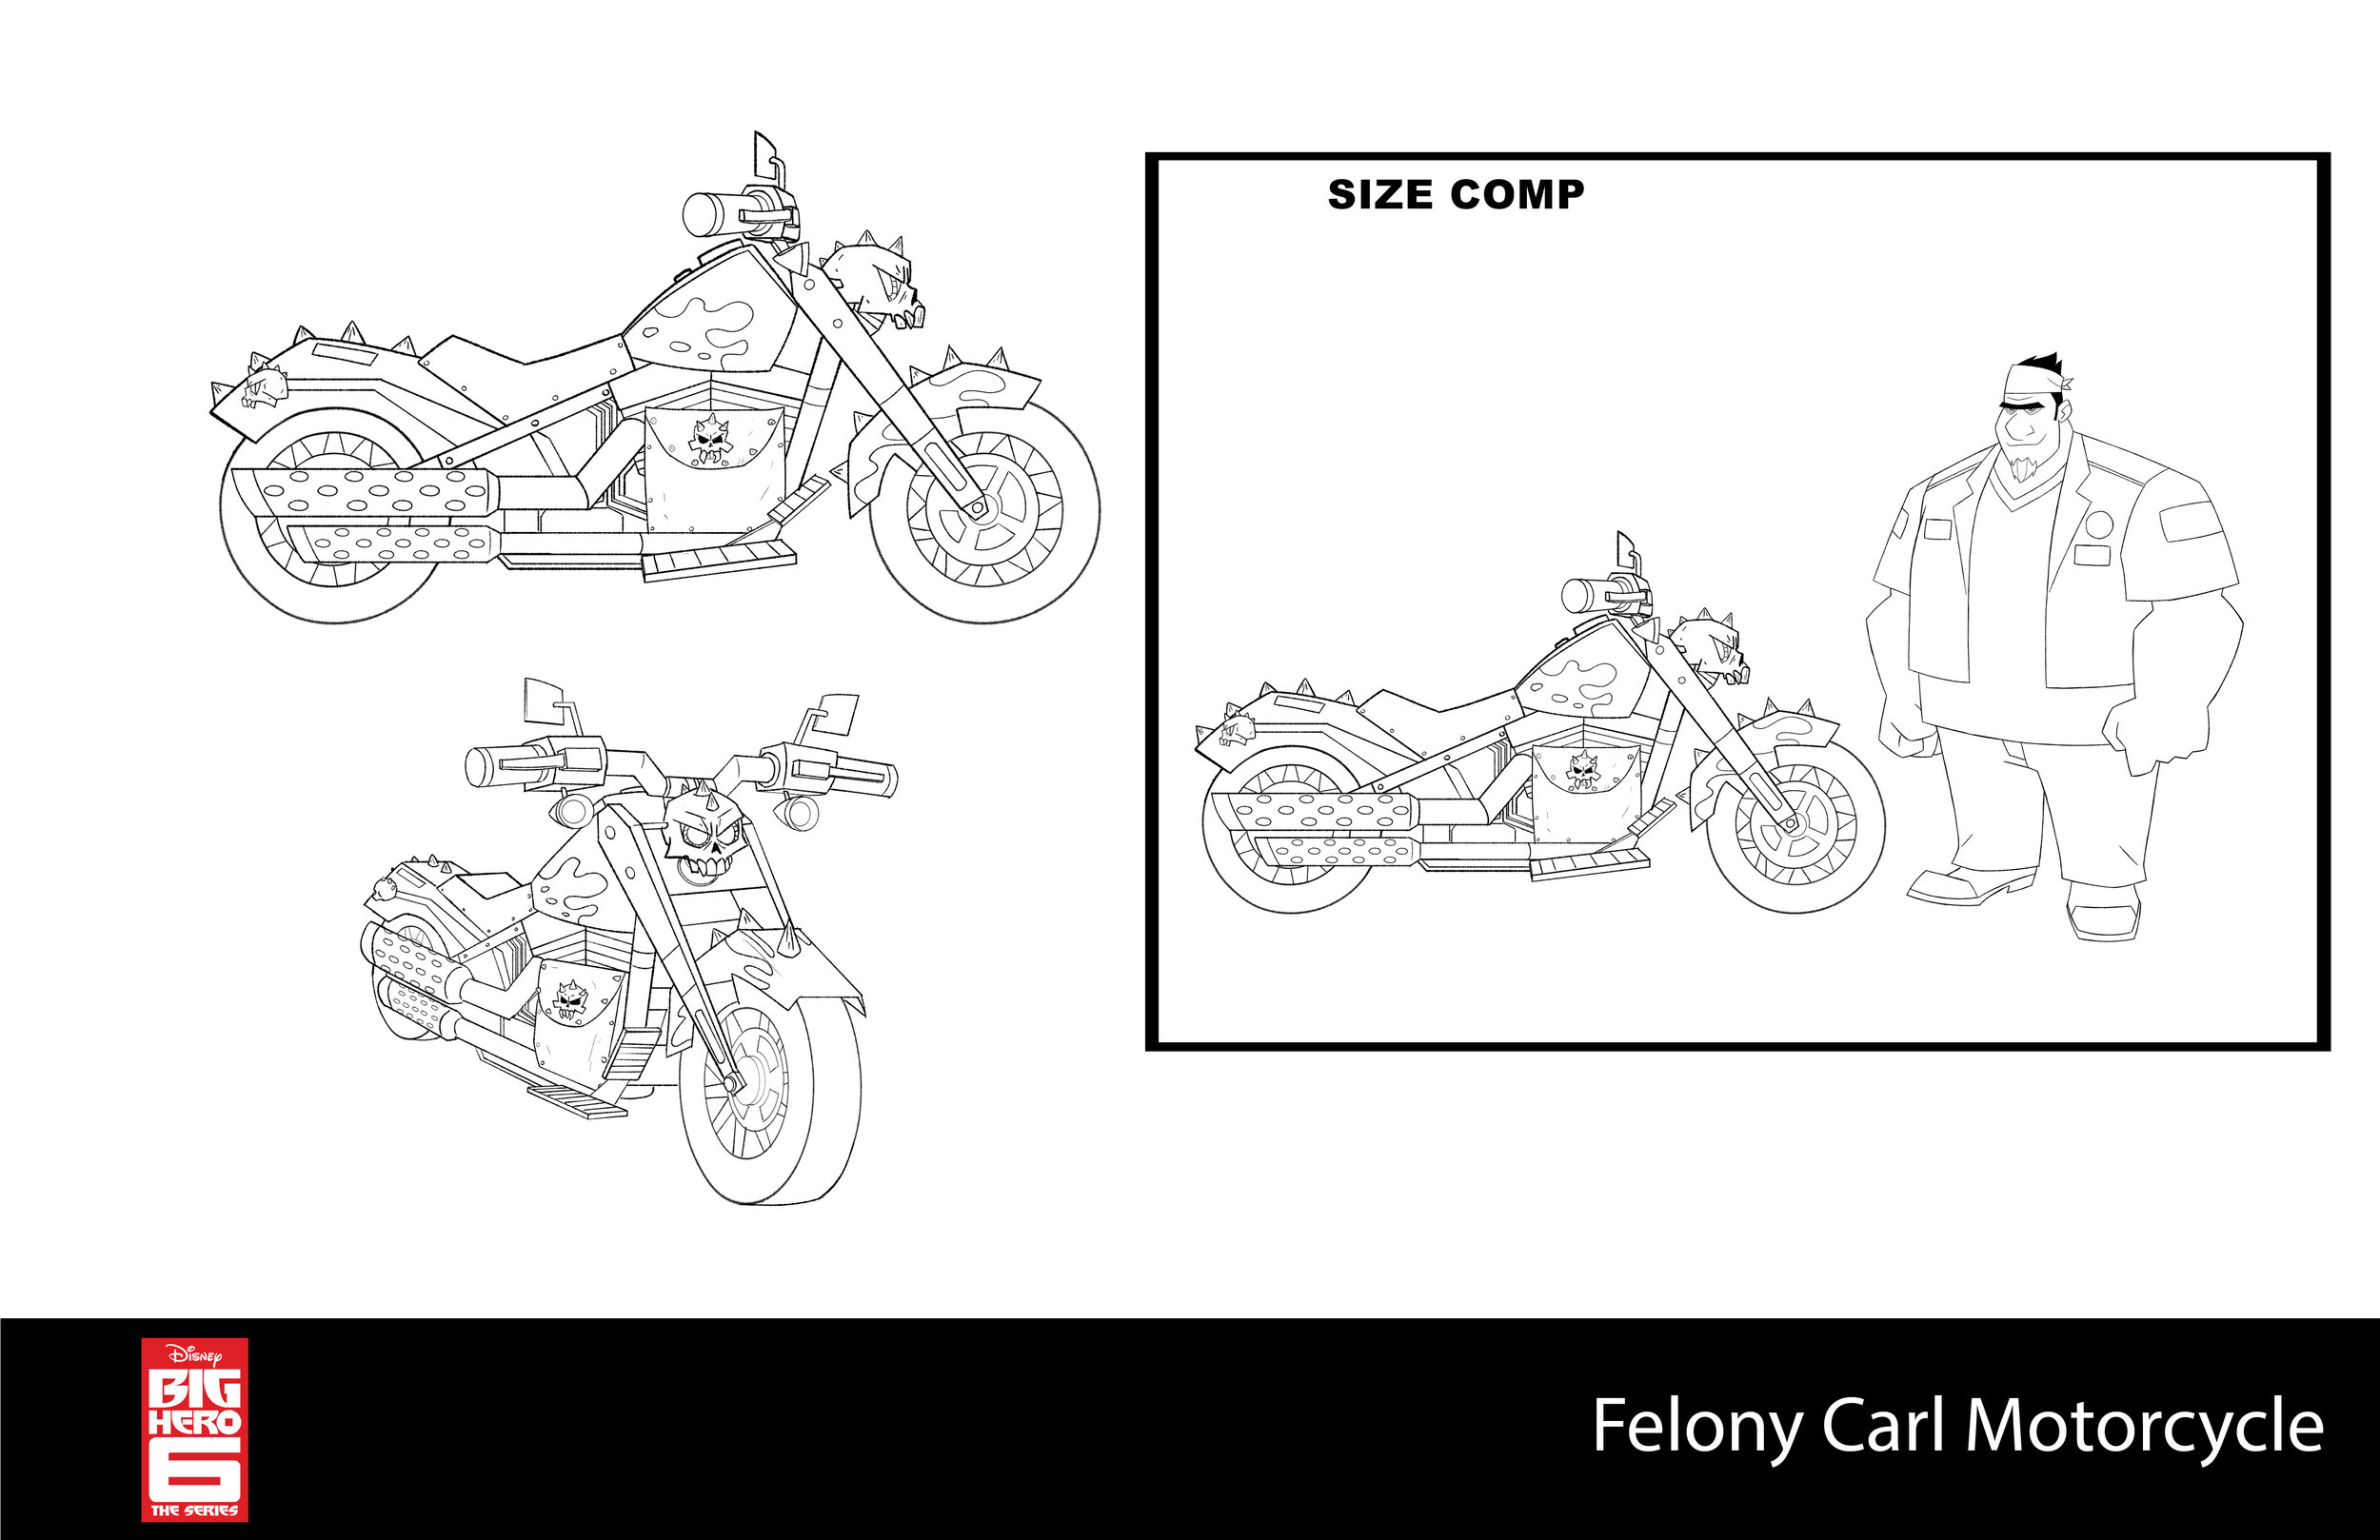 102_Motorcycle_R_V04_Size_BS.jpg